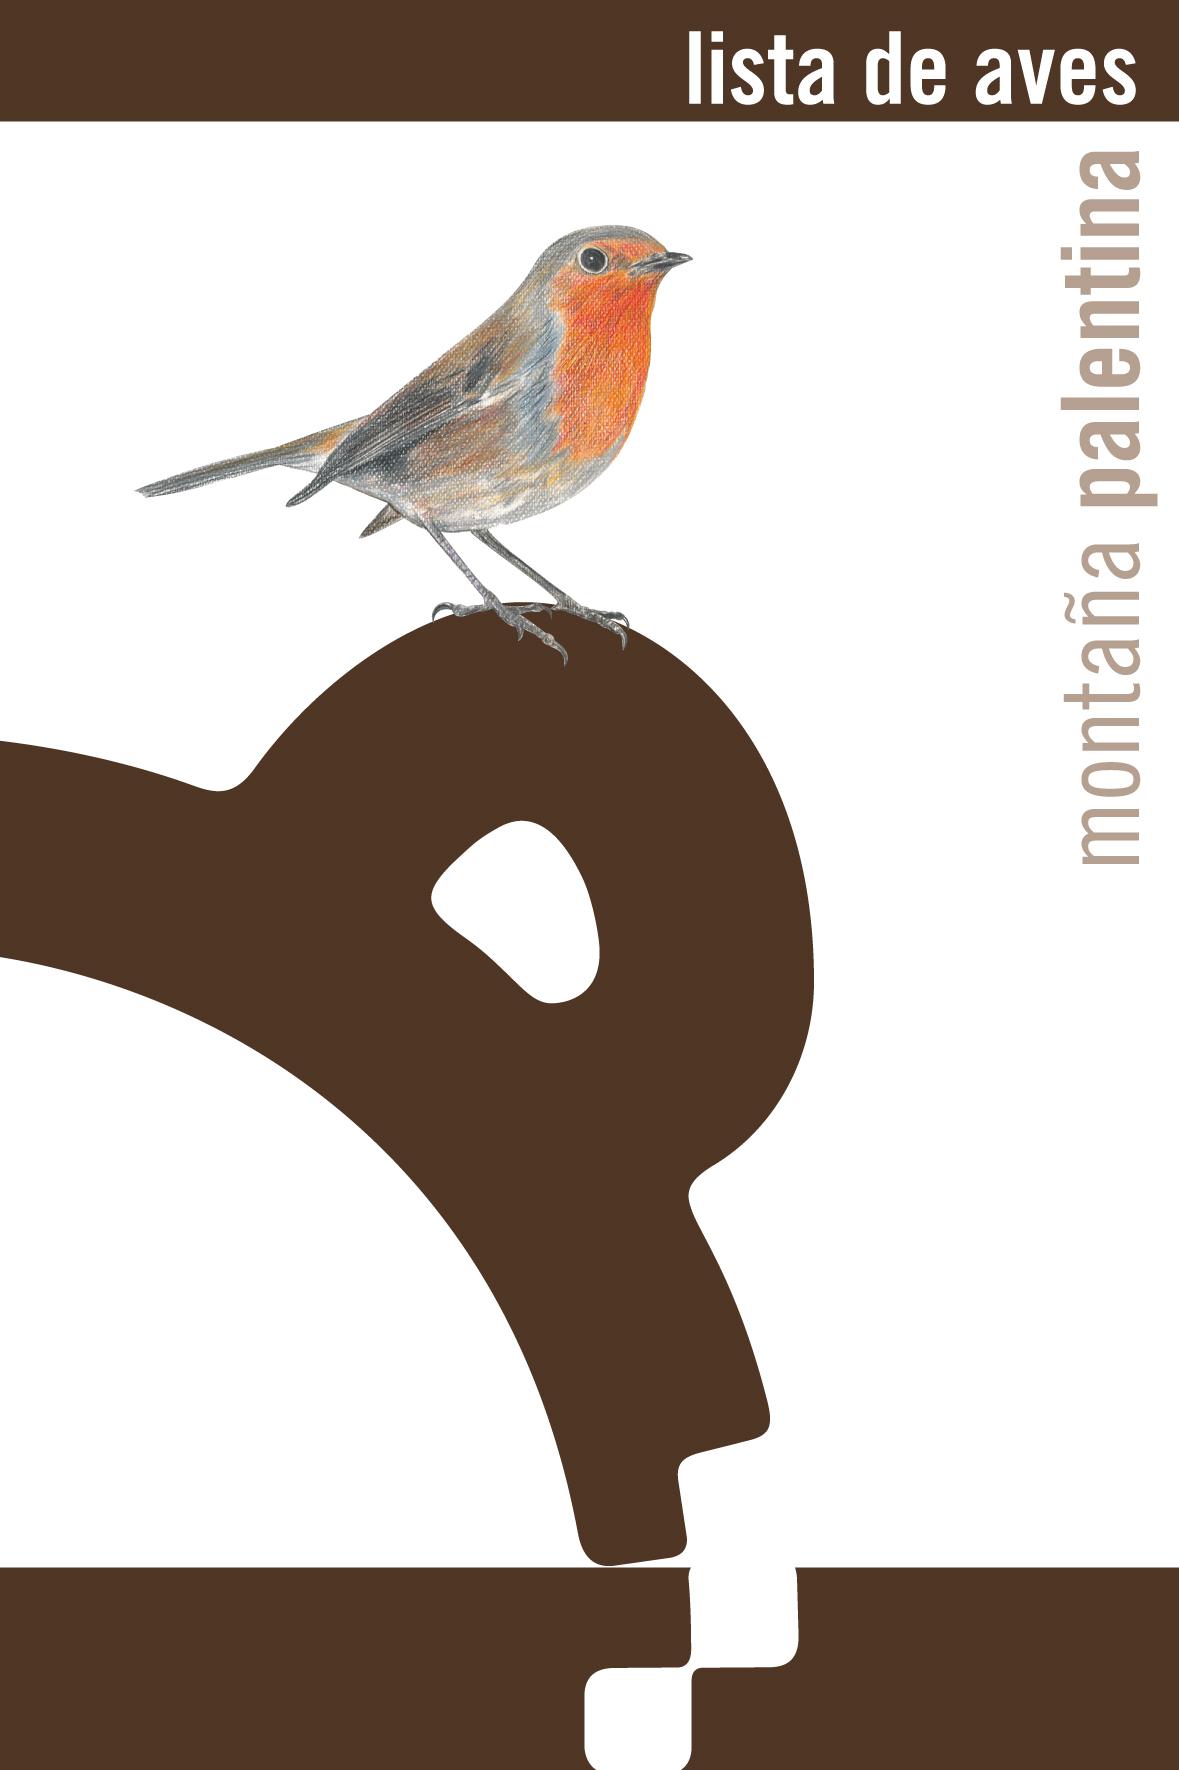 portada lista de aves